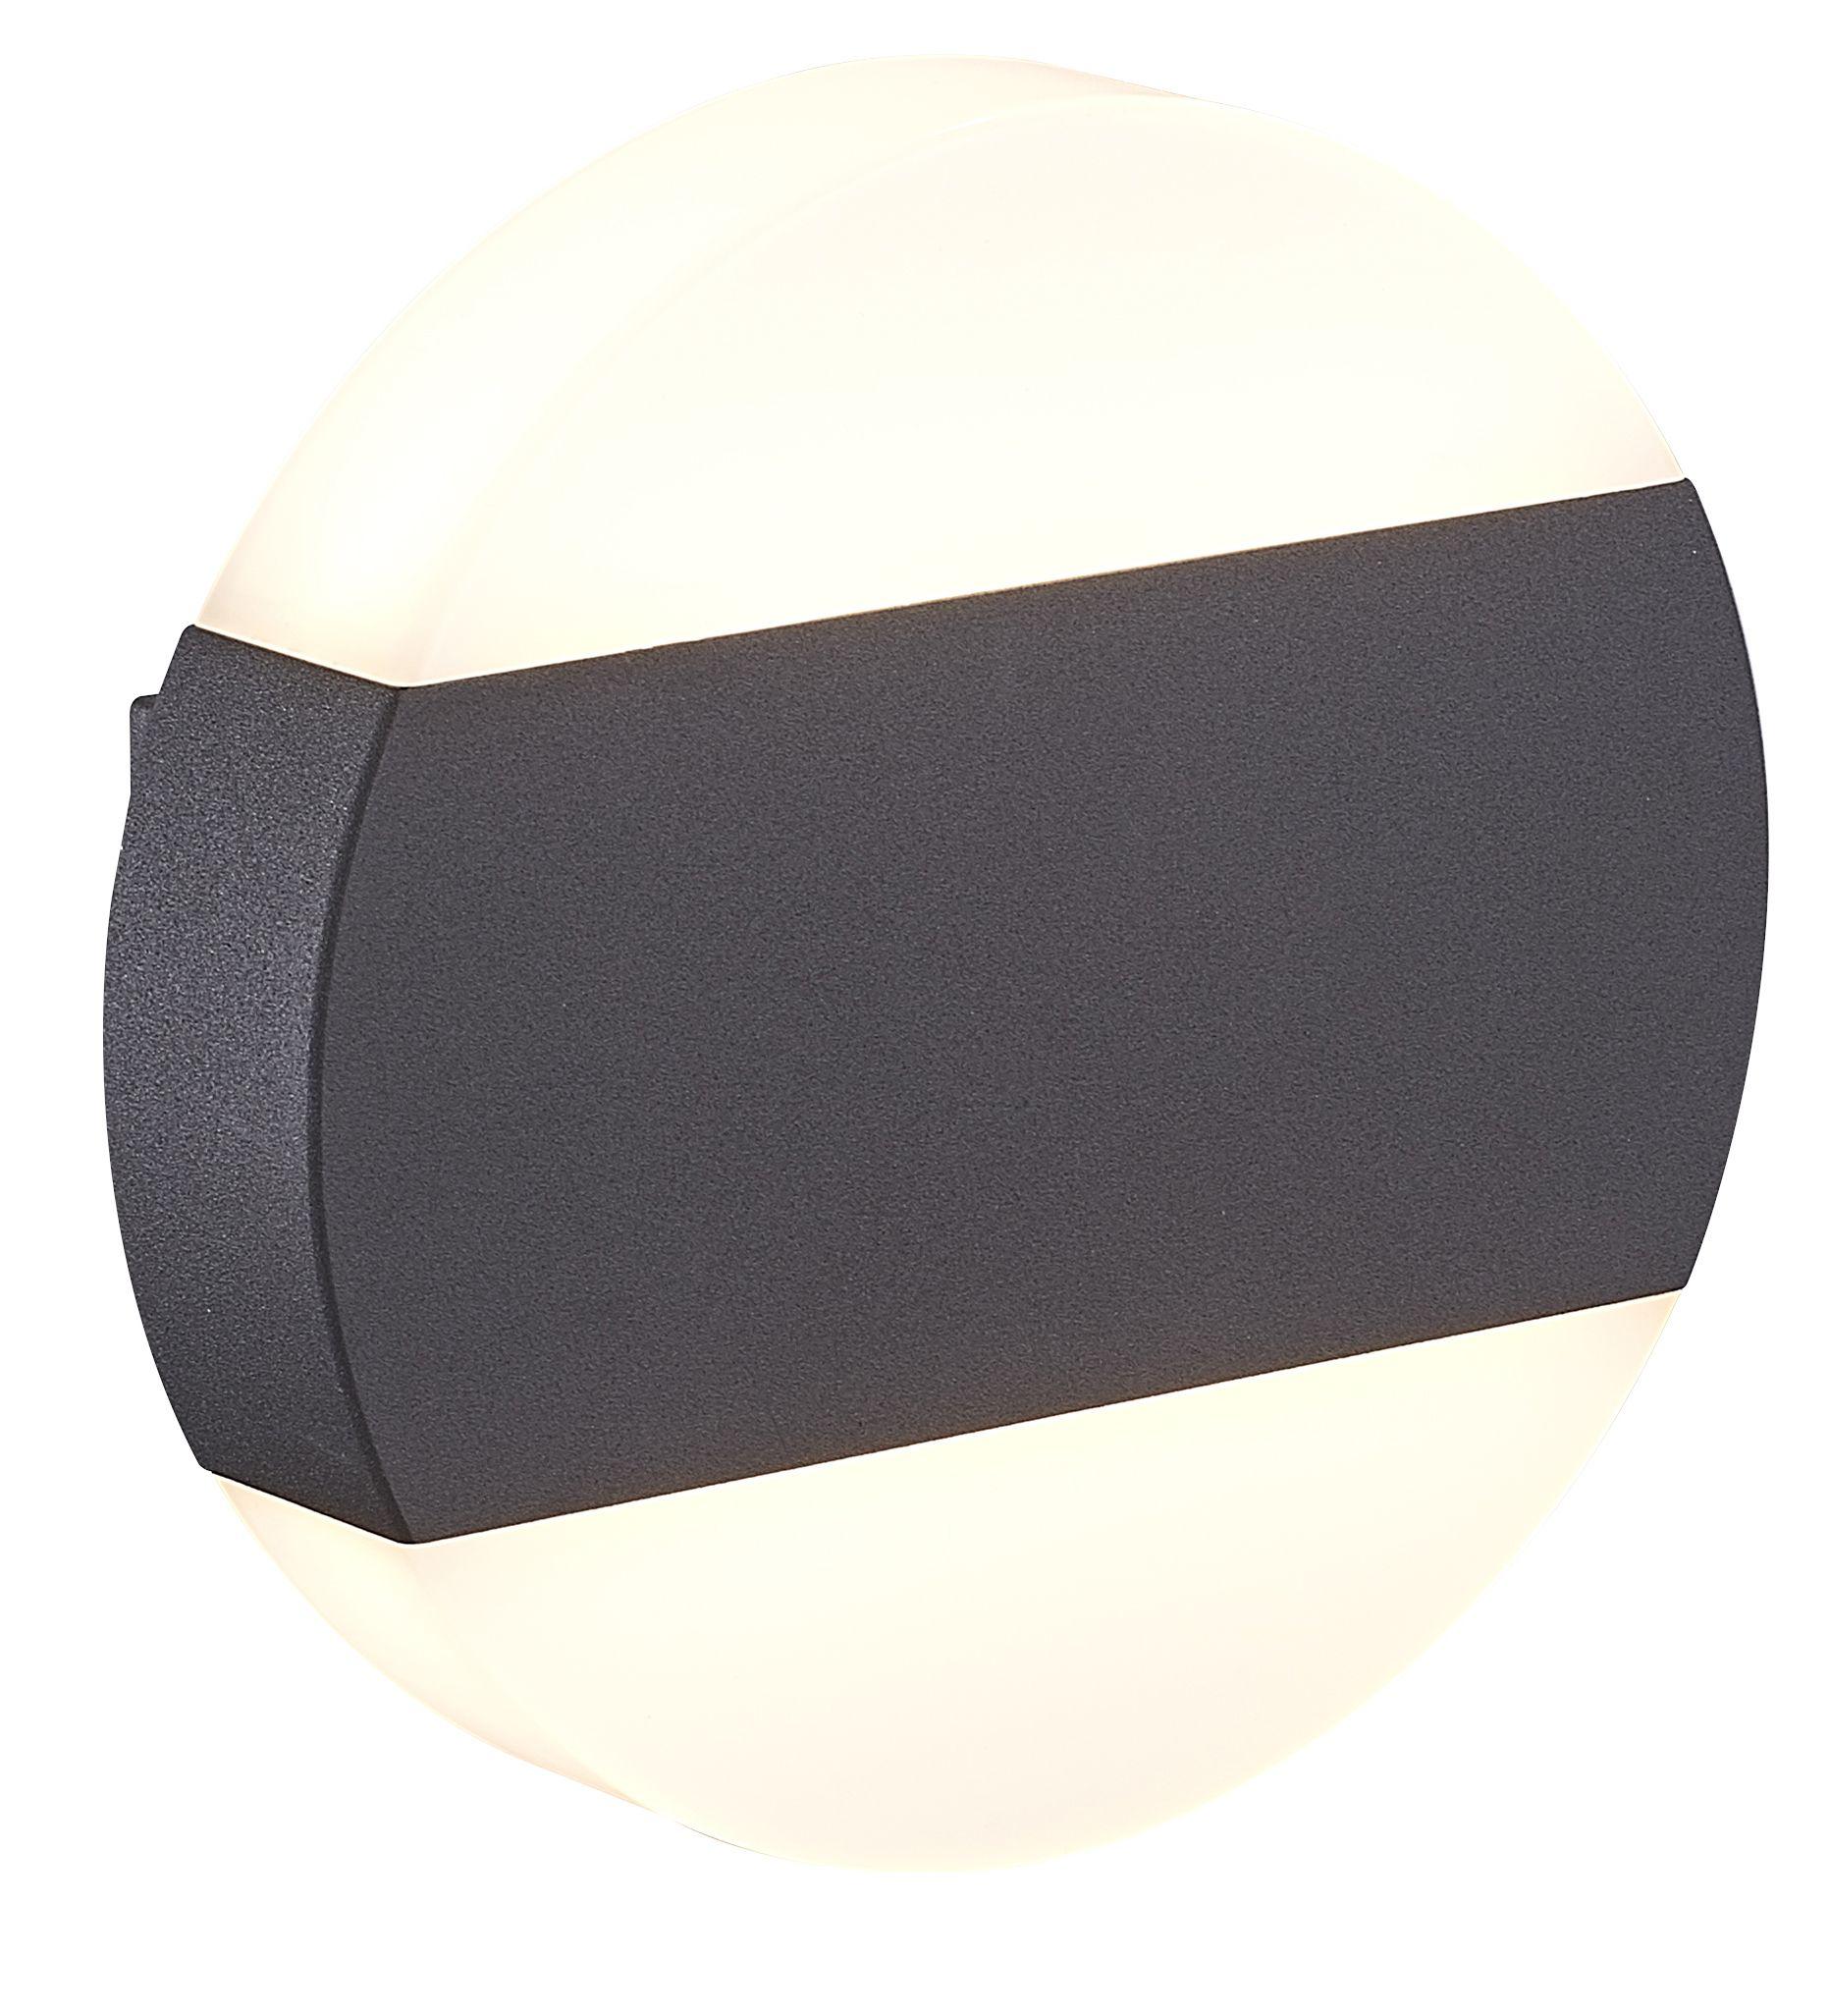 Blooma Graeae Black Mains Powered Circular External Wall Light